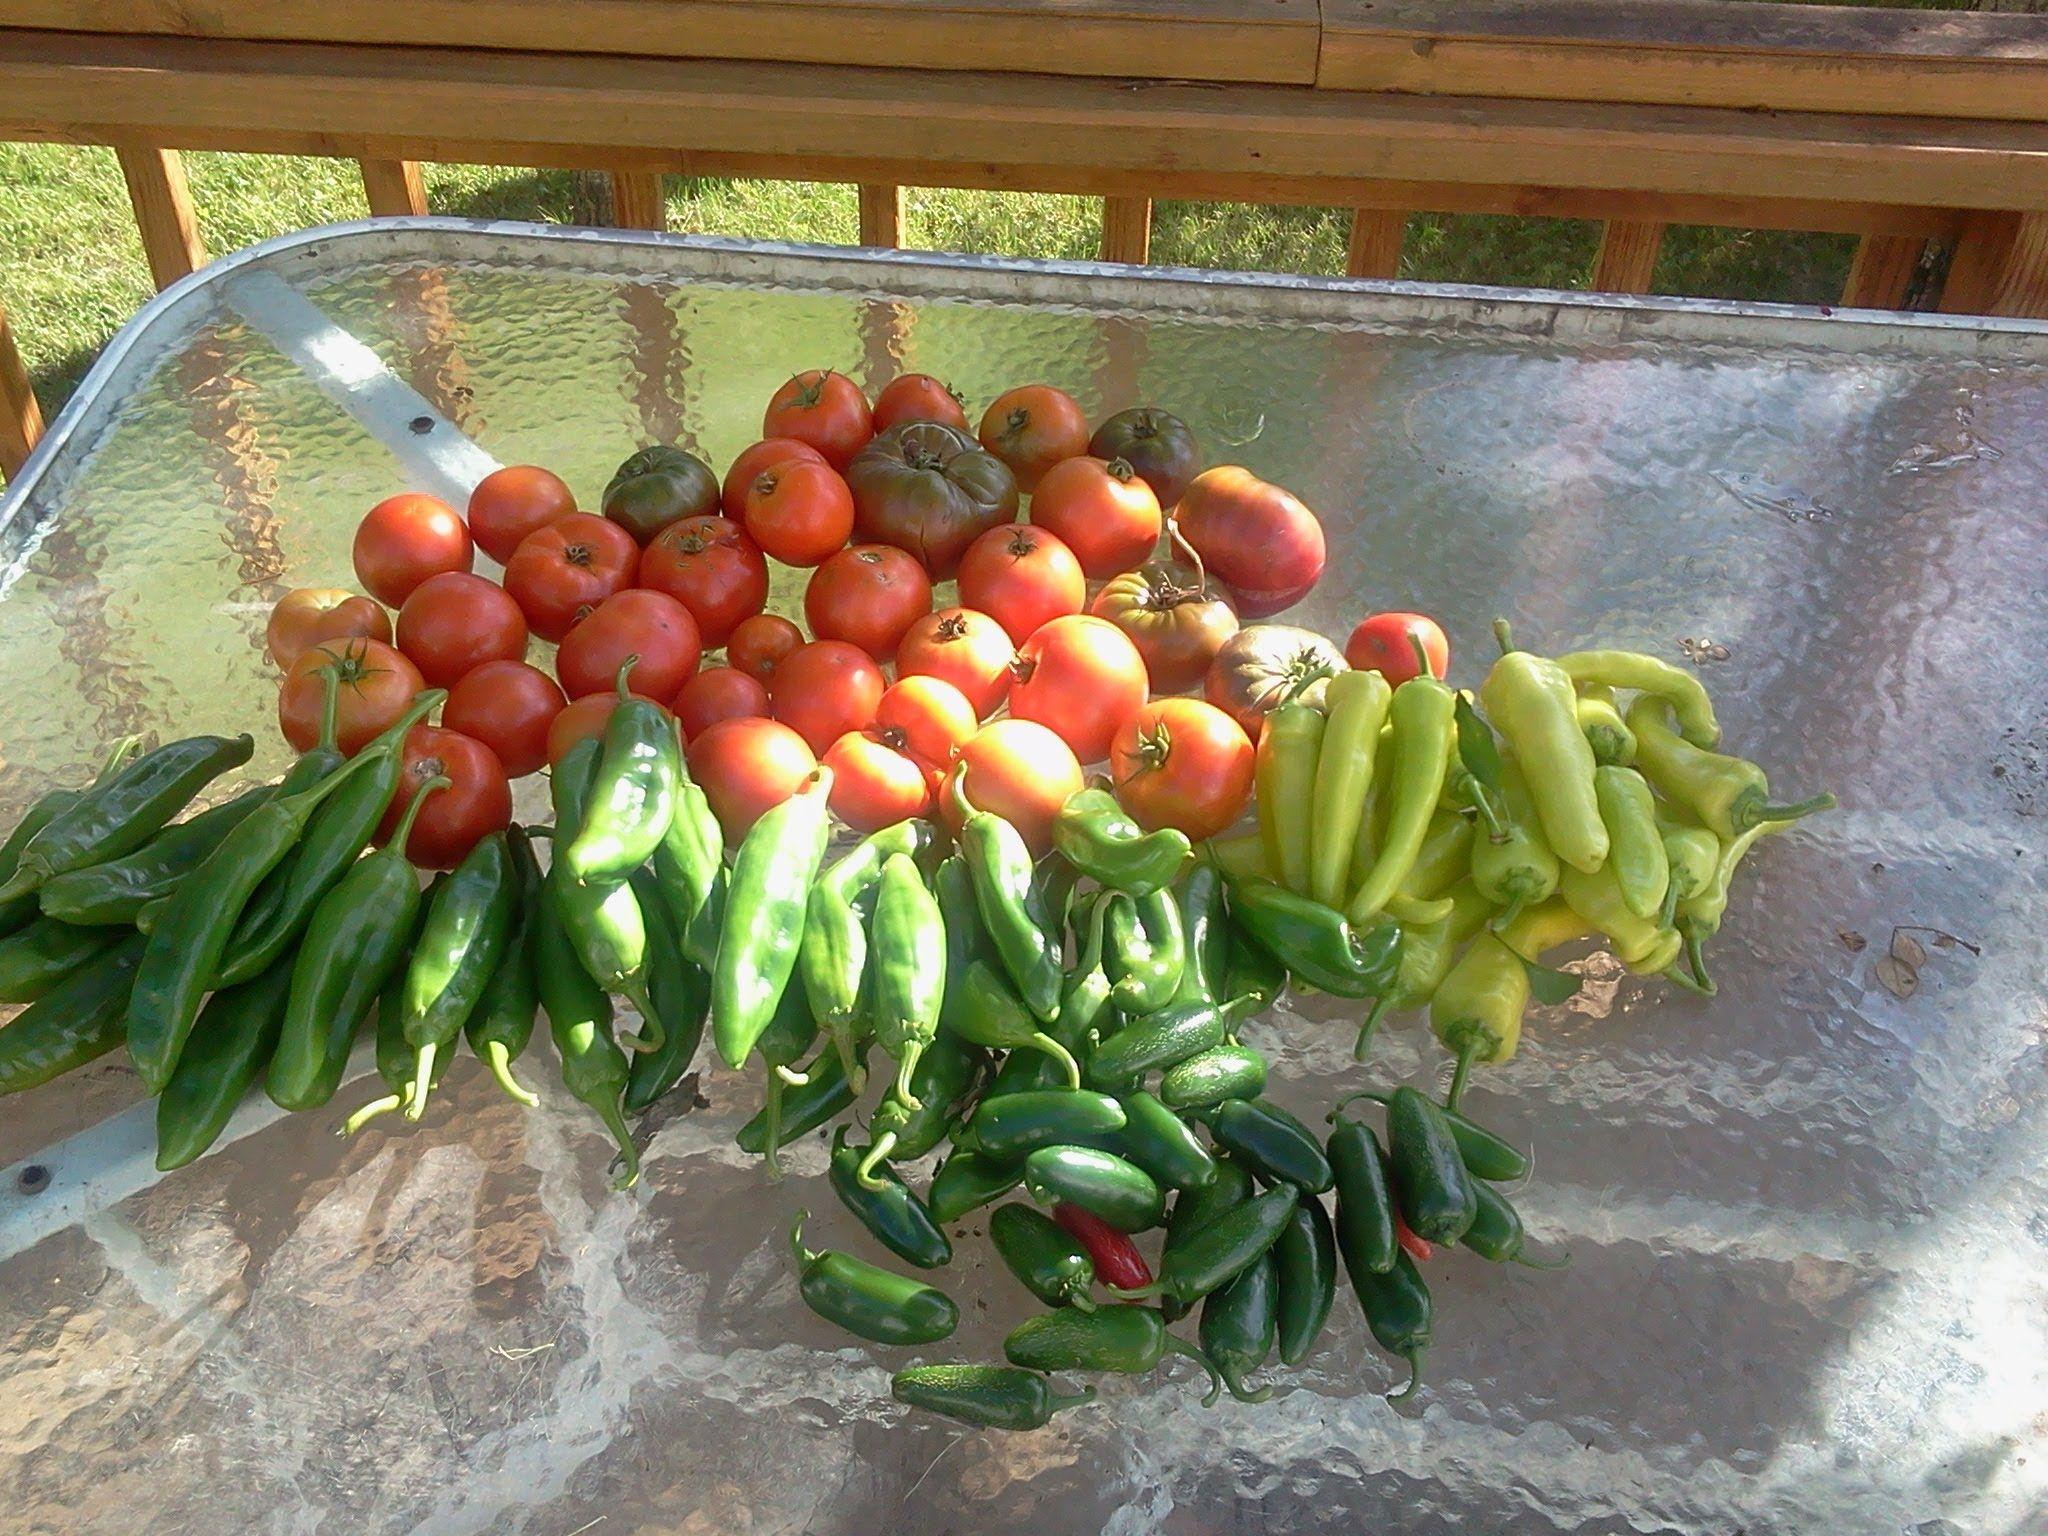 Incroyable Hybrid Rain Gutter Grow System, Kiddie Pool Grow System, The Pop Bottle  Garden!